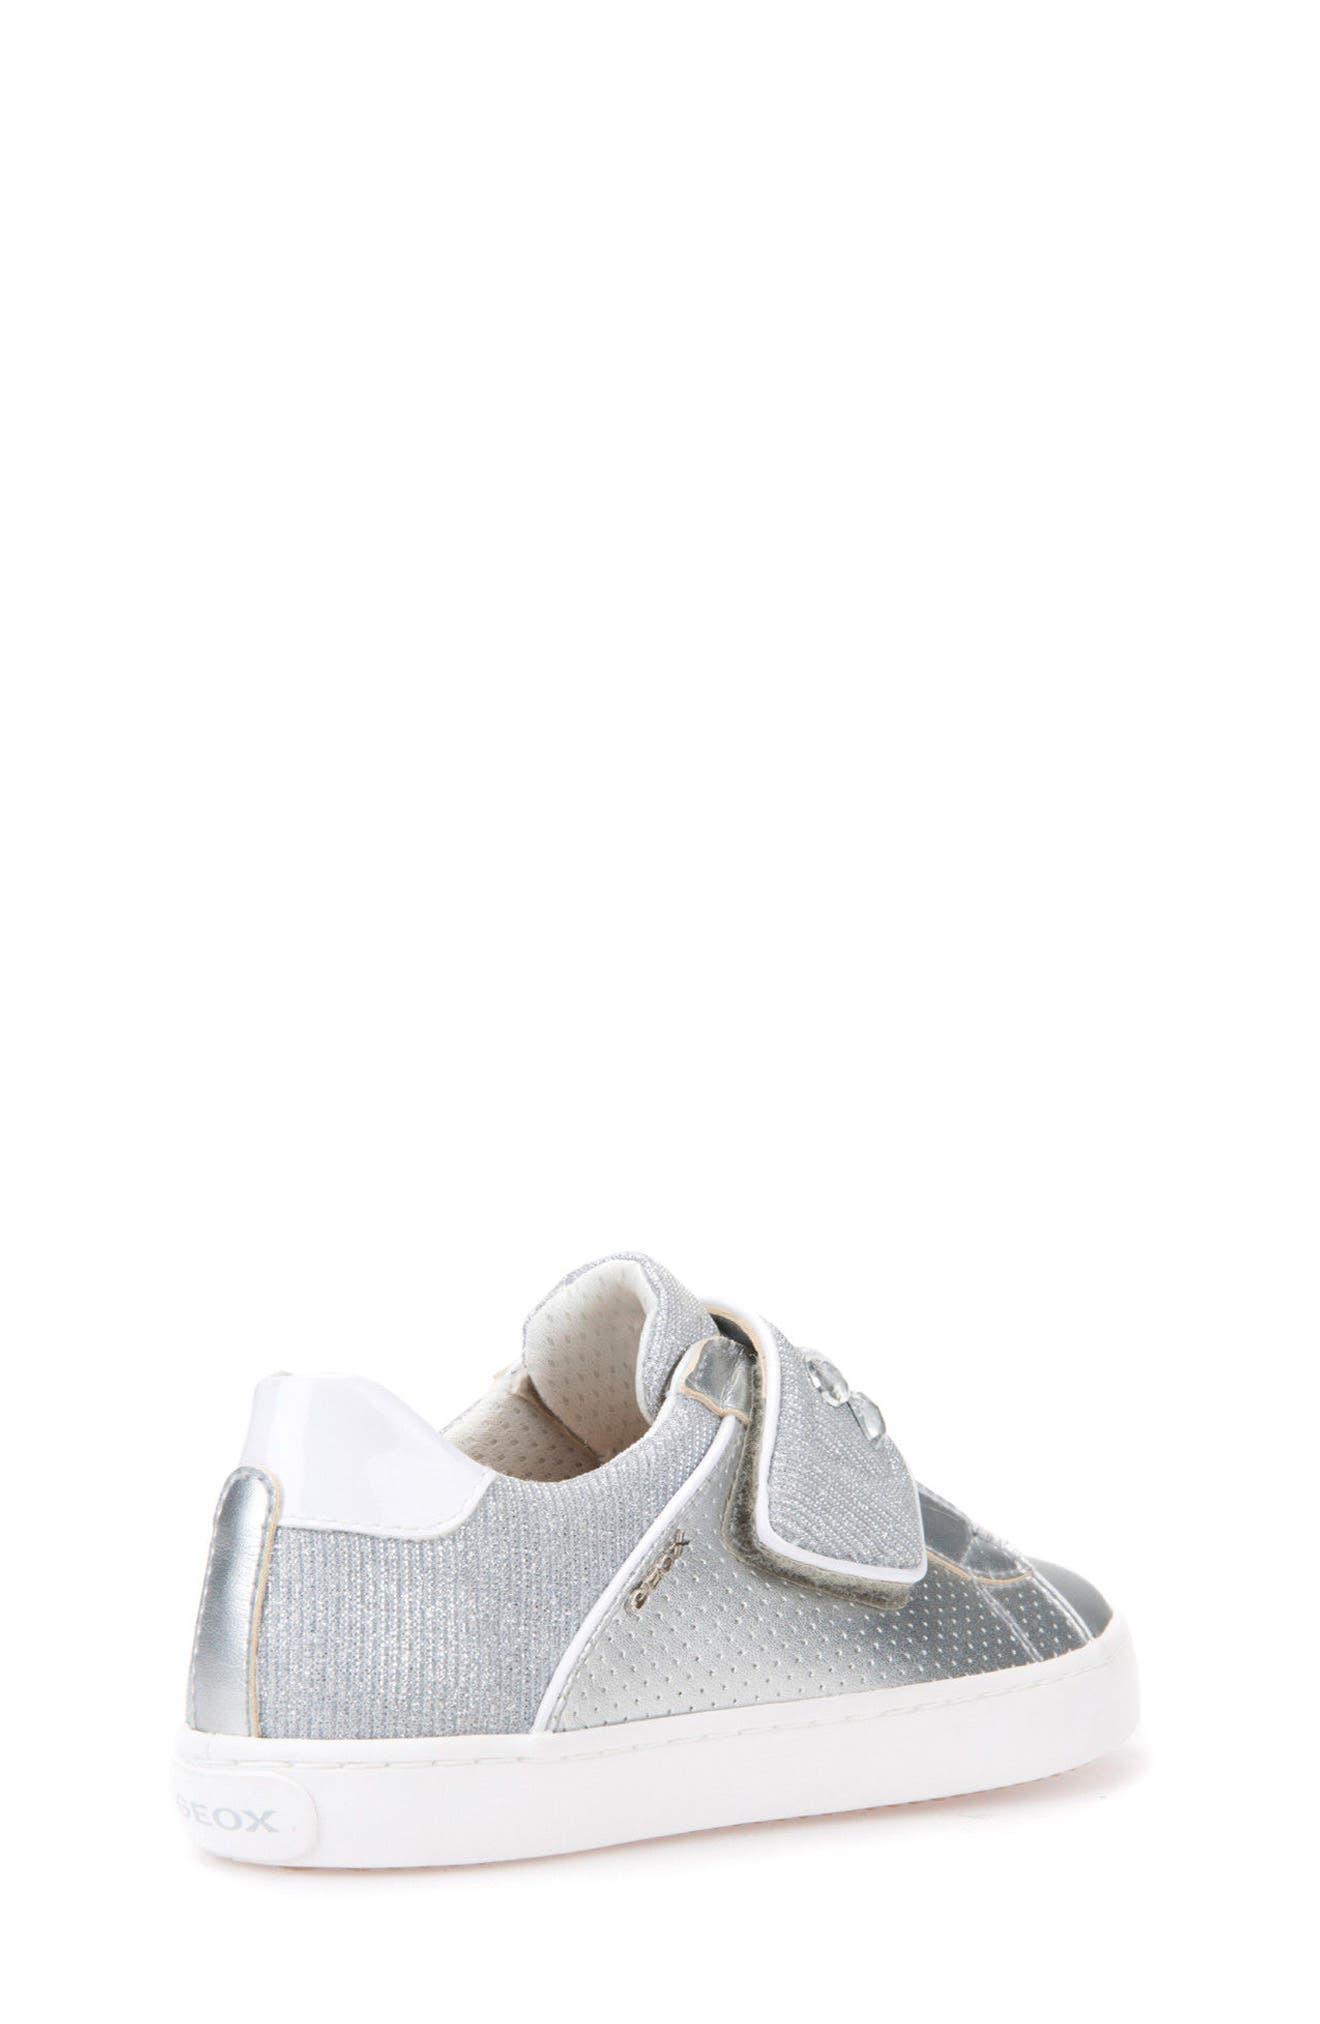 Kilwi Metallic Embellished Sneaker,                             Alternate thumbnail 2, color,                             SILVER